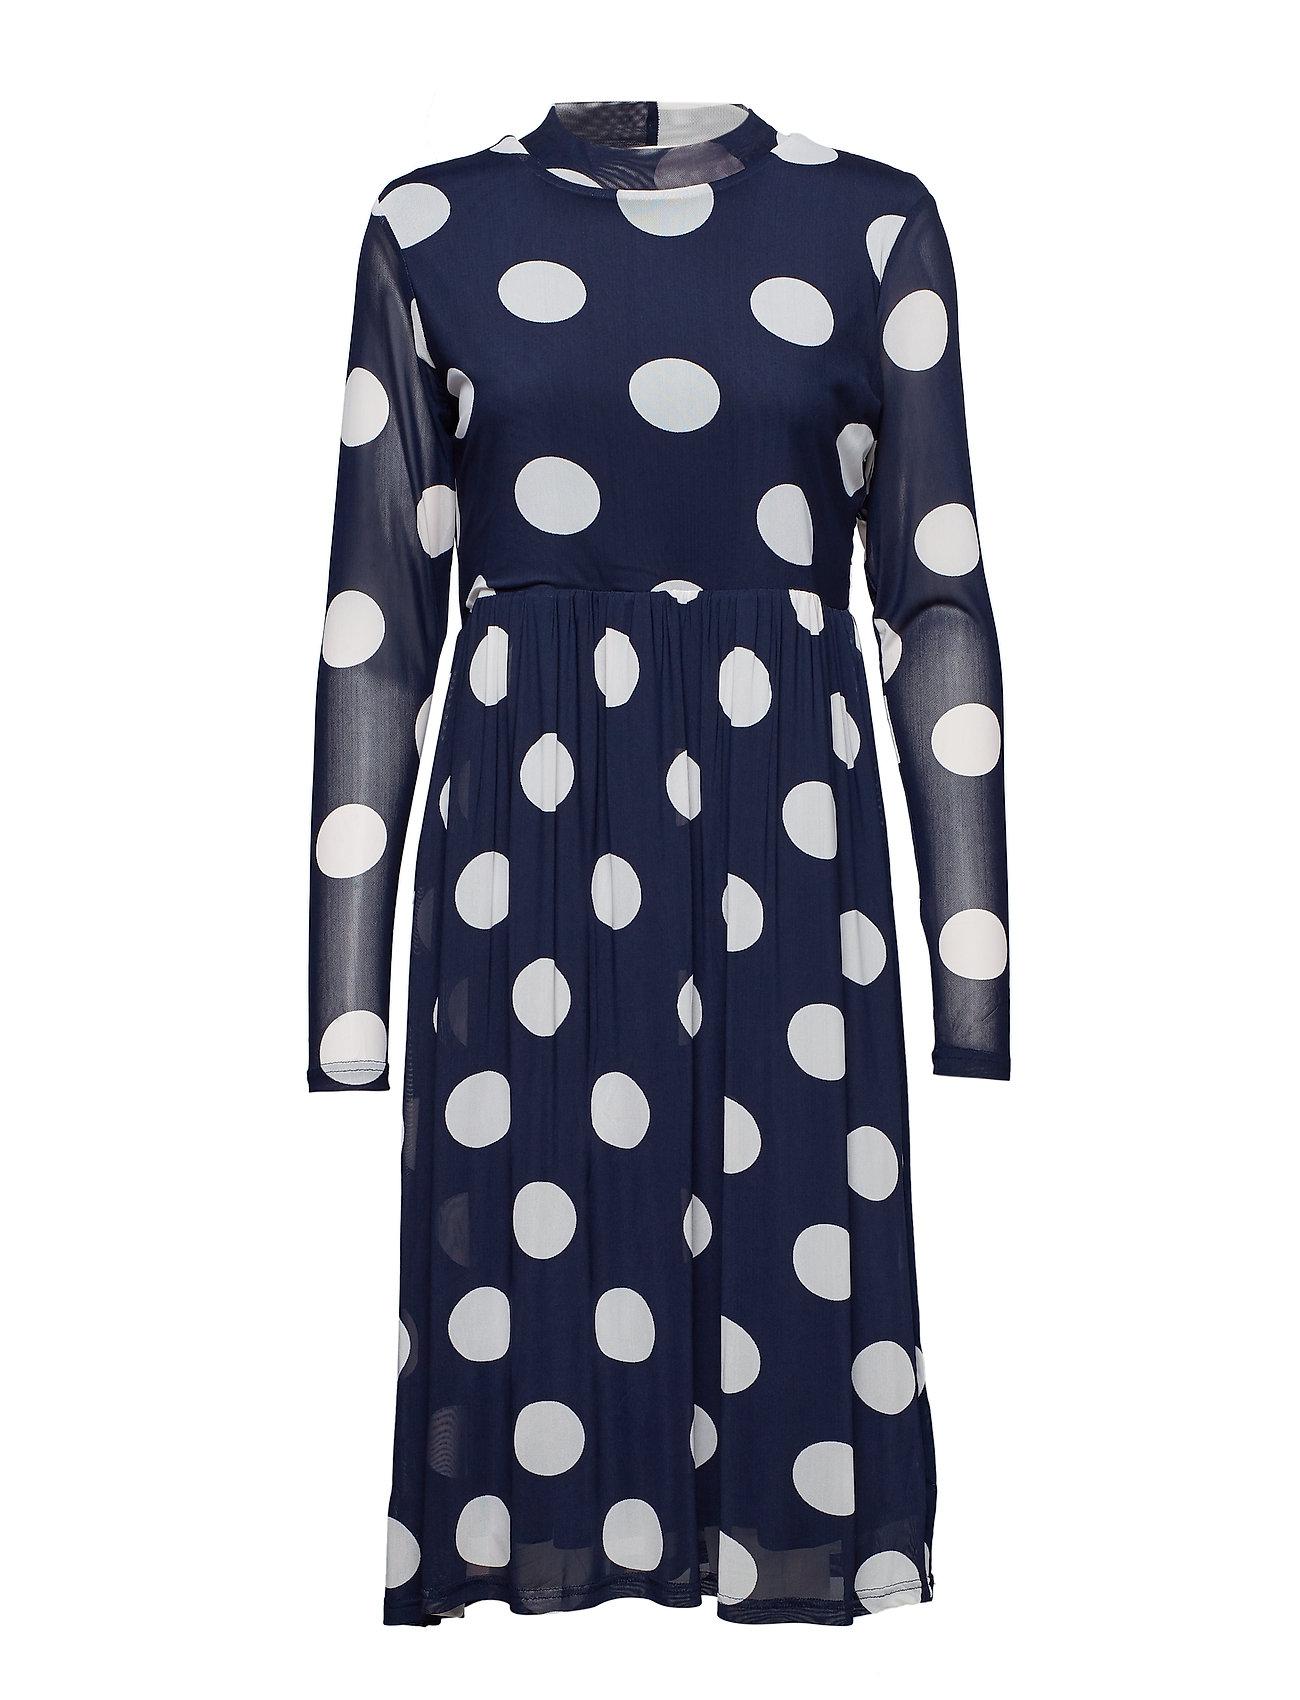 Kaffe Bobbie dot dress - MIDNIGHT MARINE / CHALK